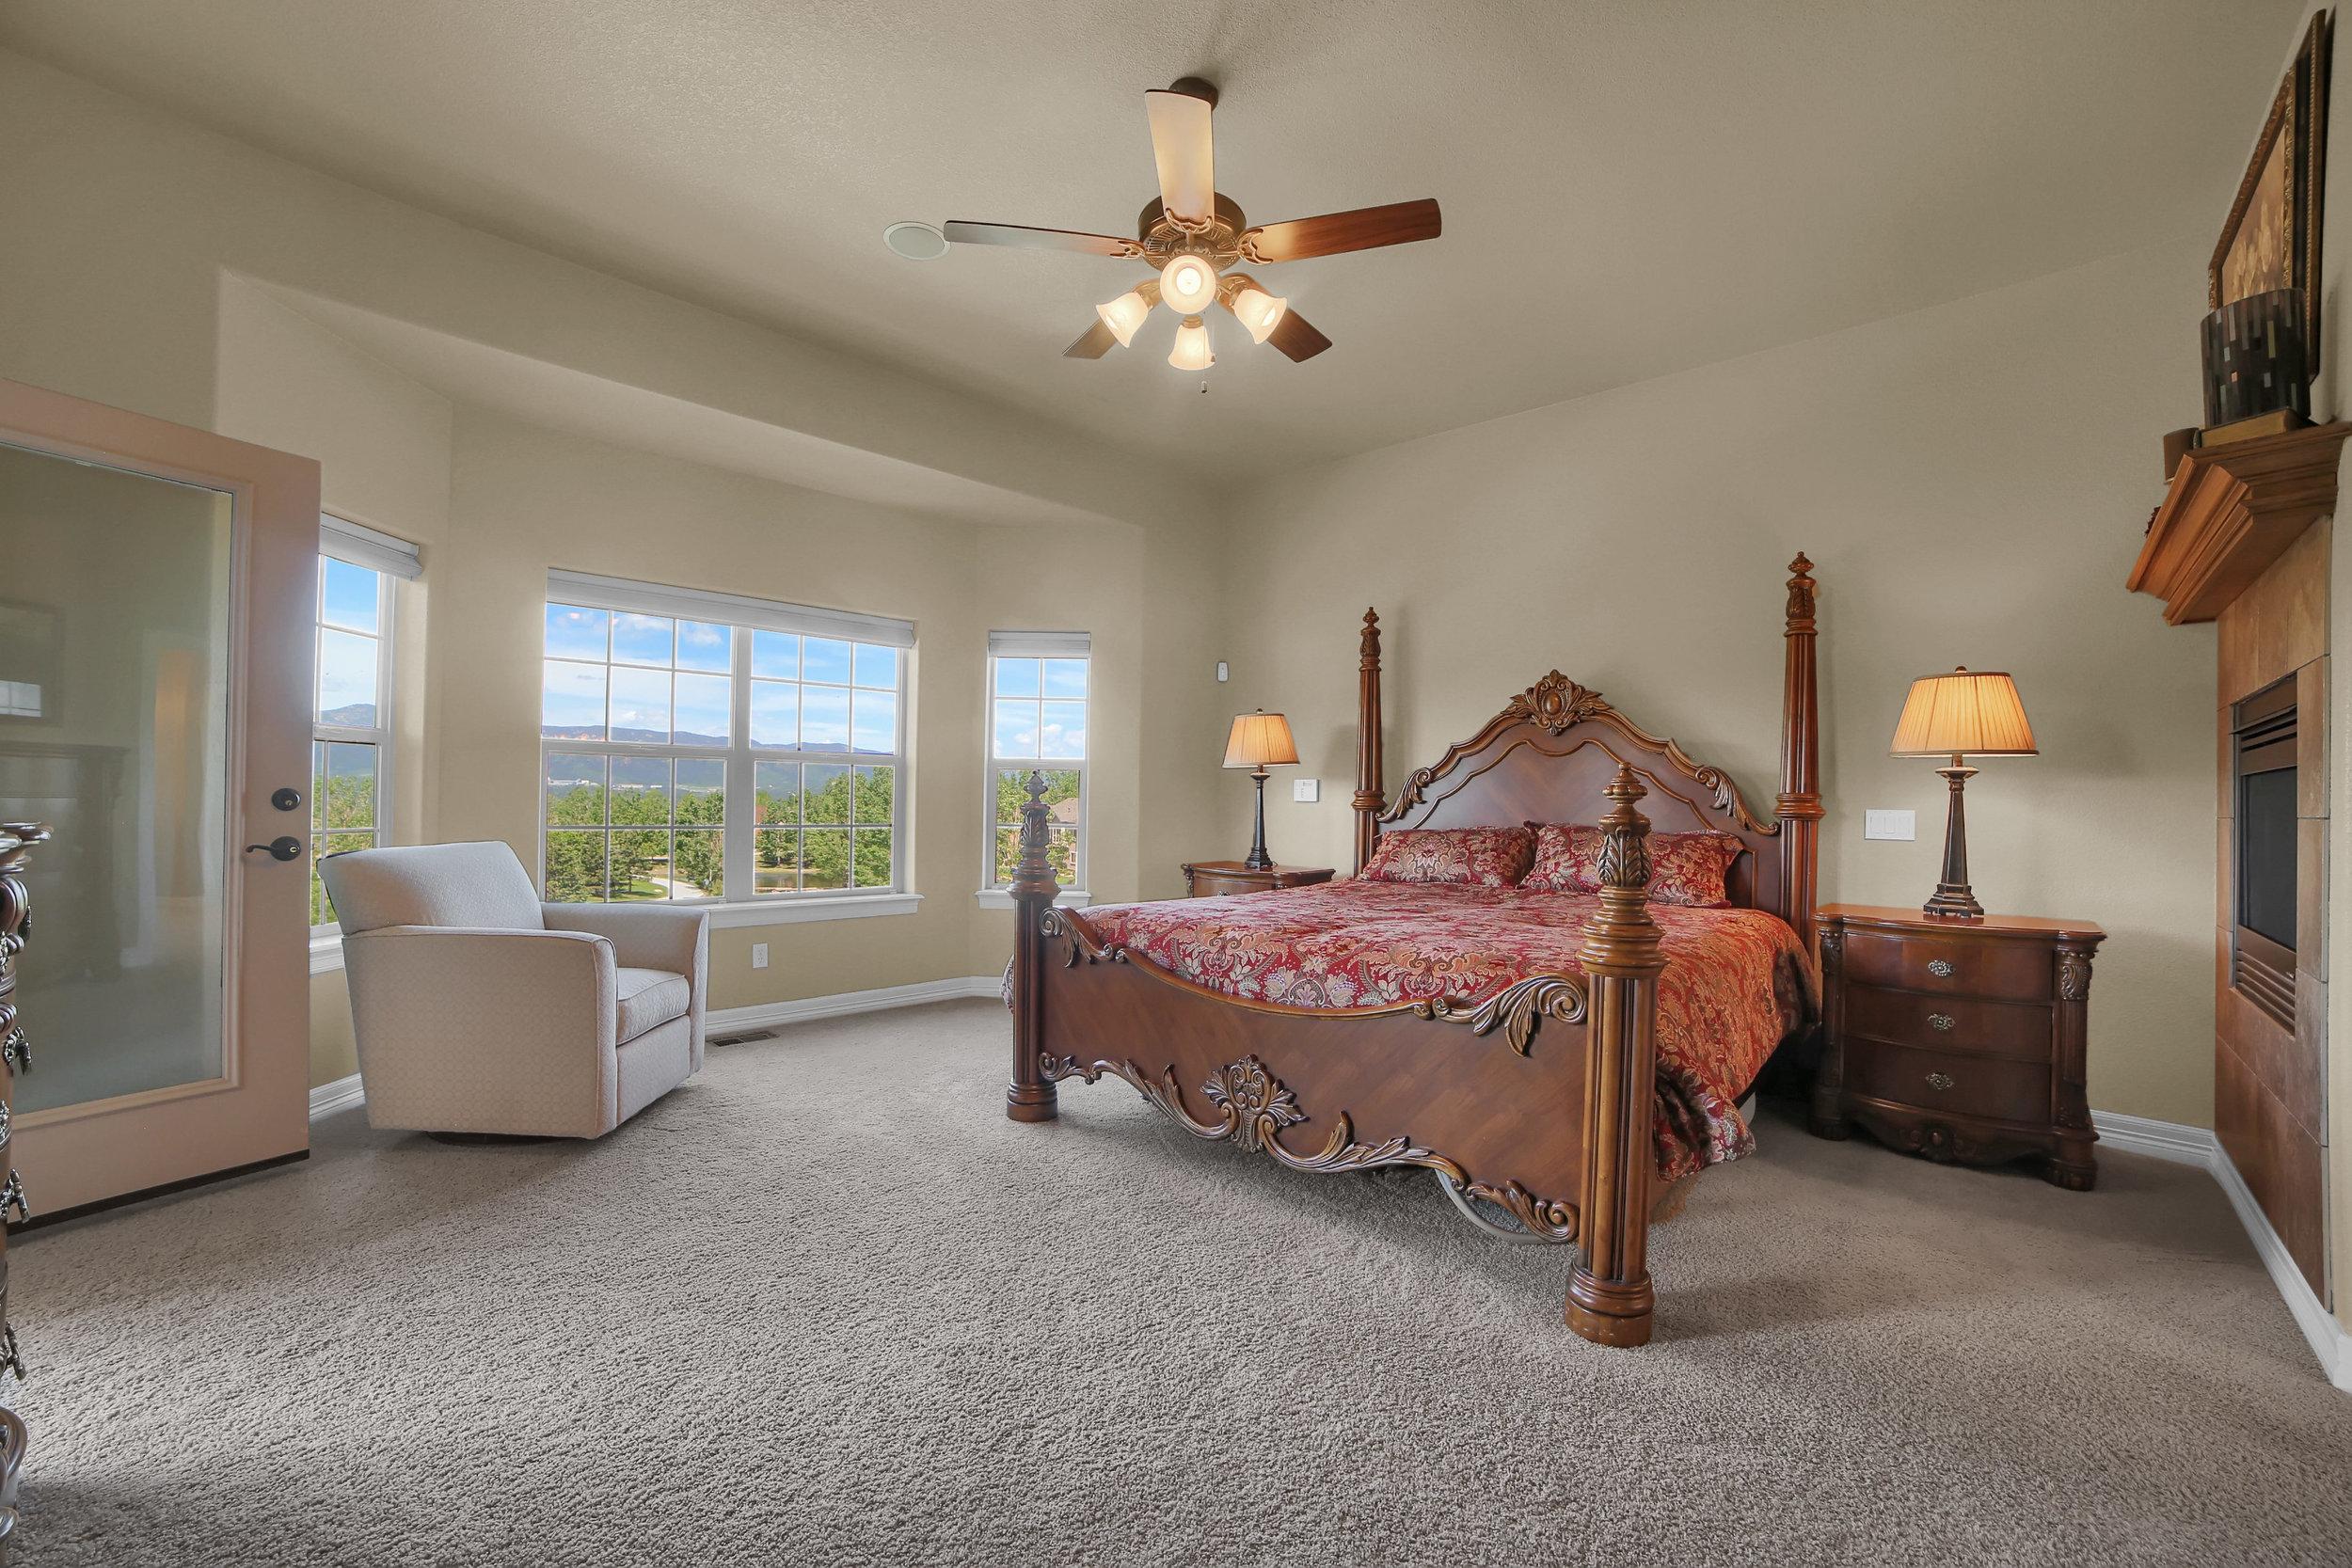 12496 Creekhurst Dr Colorado-print-050-031-Bedroom-3648x2432-300dpi.jpg